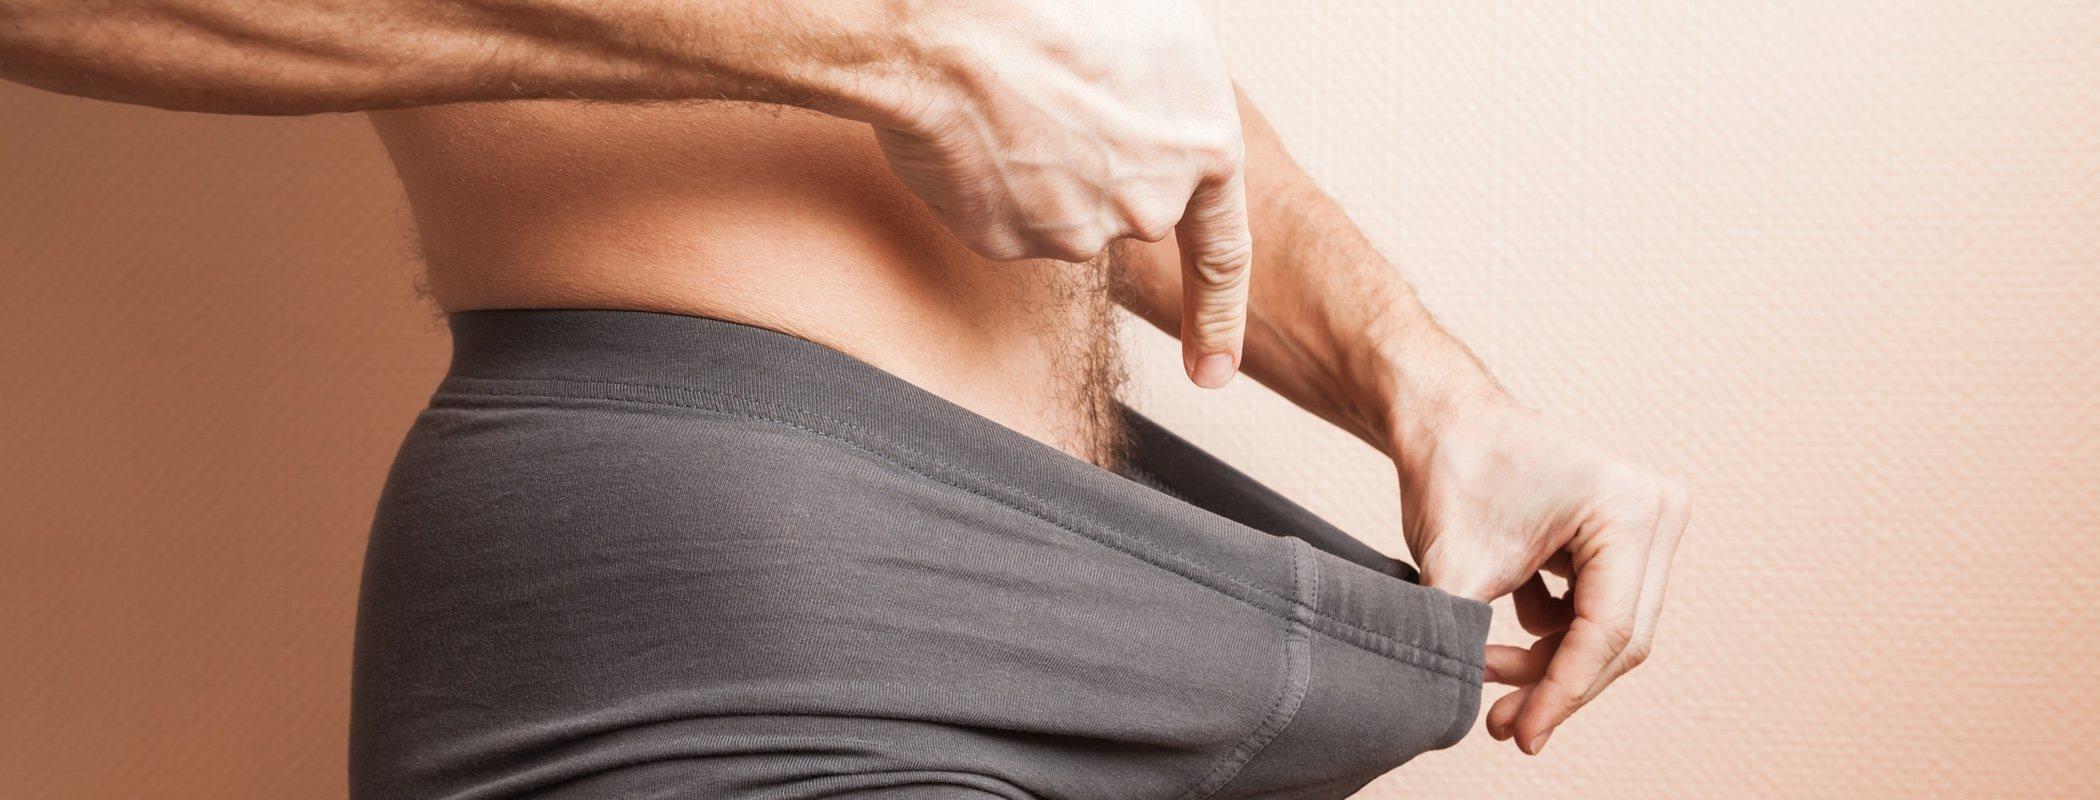 Consejos para la higiene íntima masculina